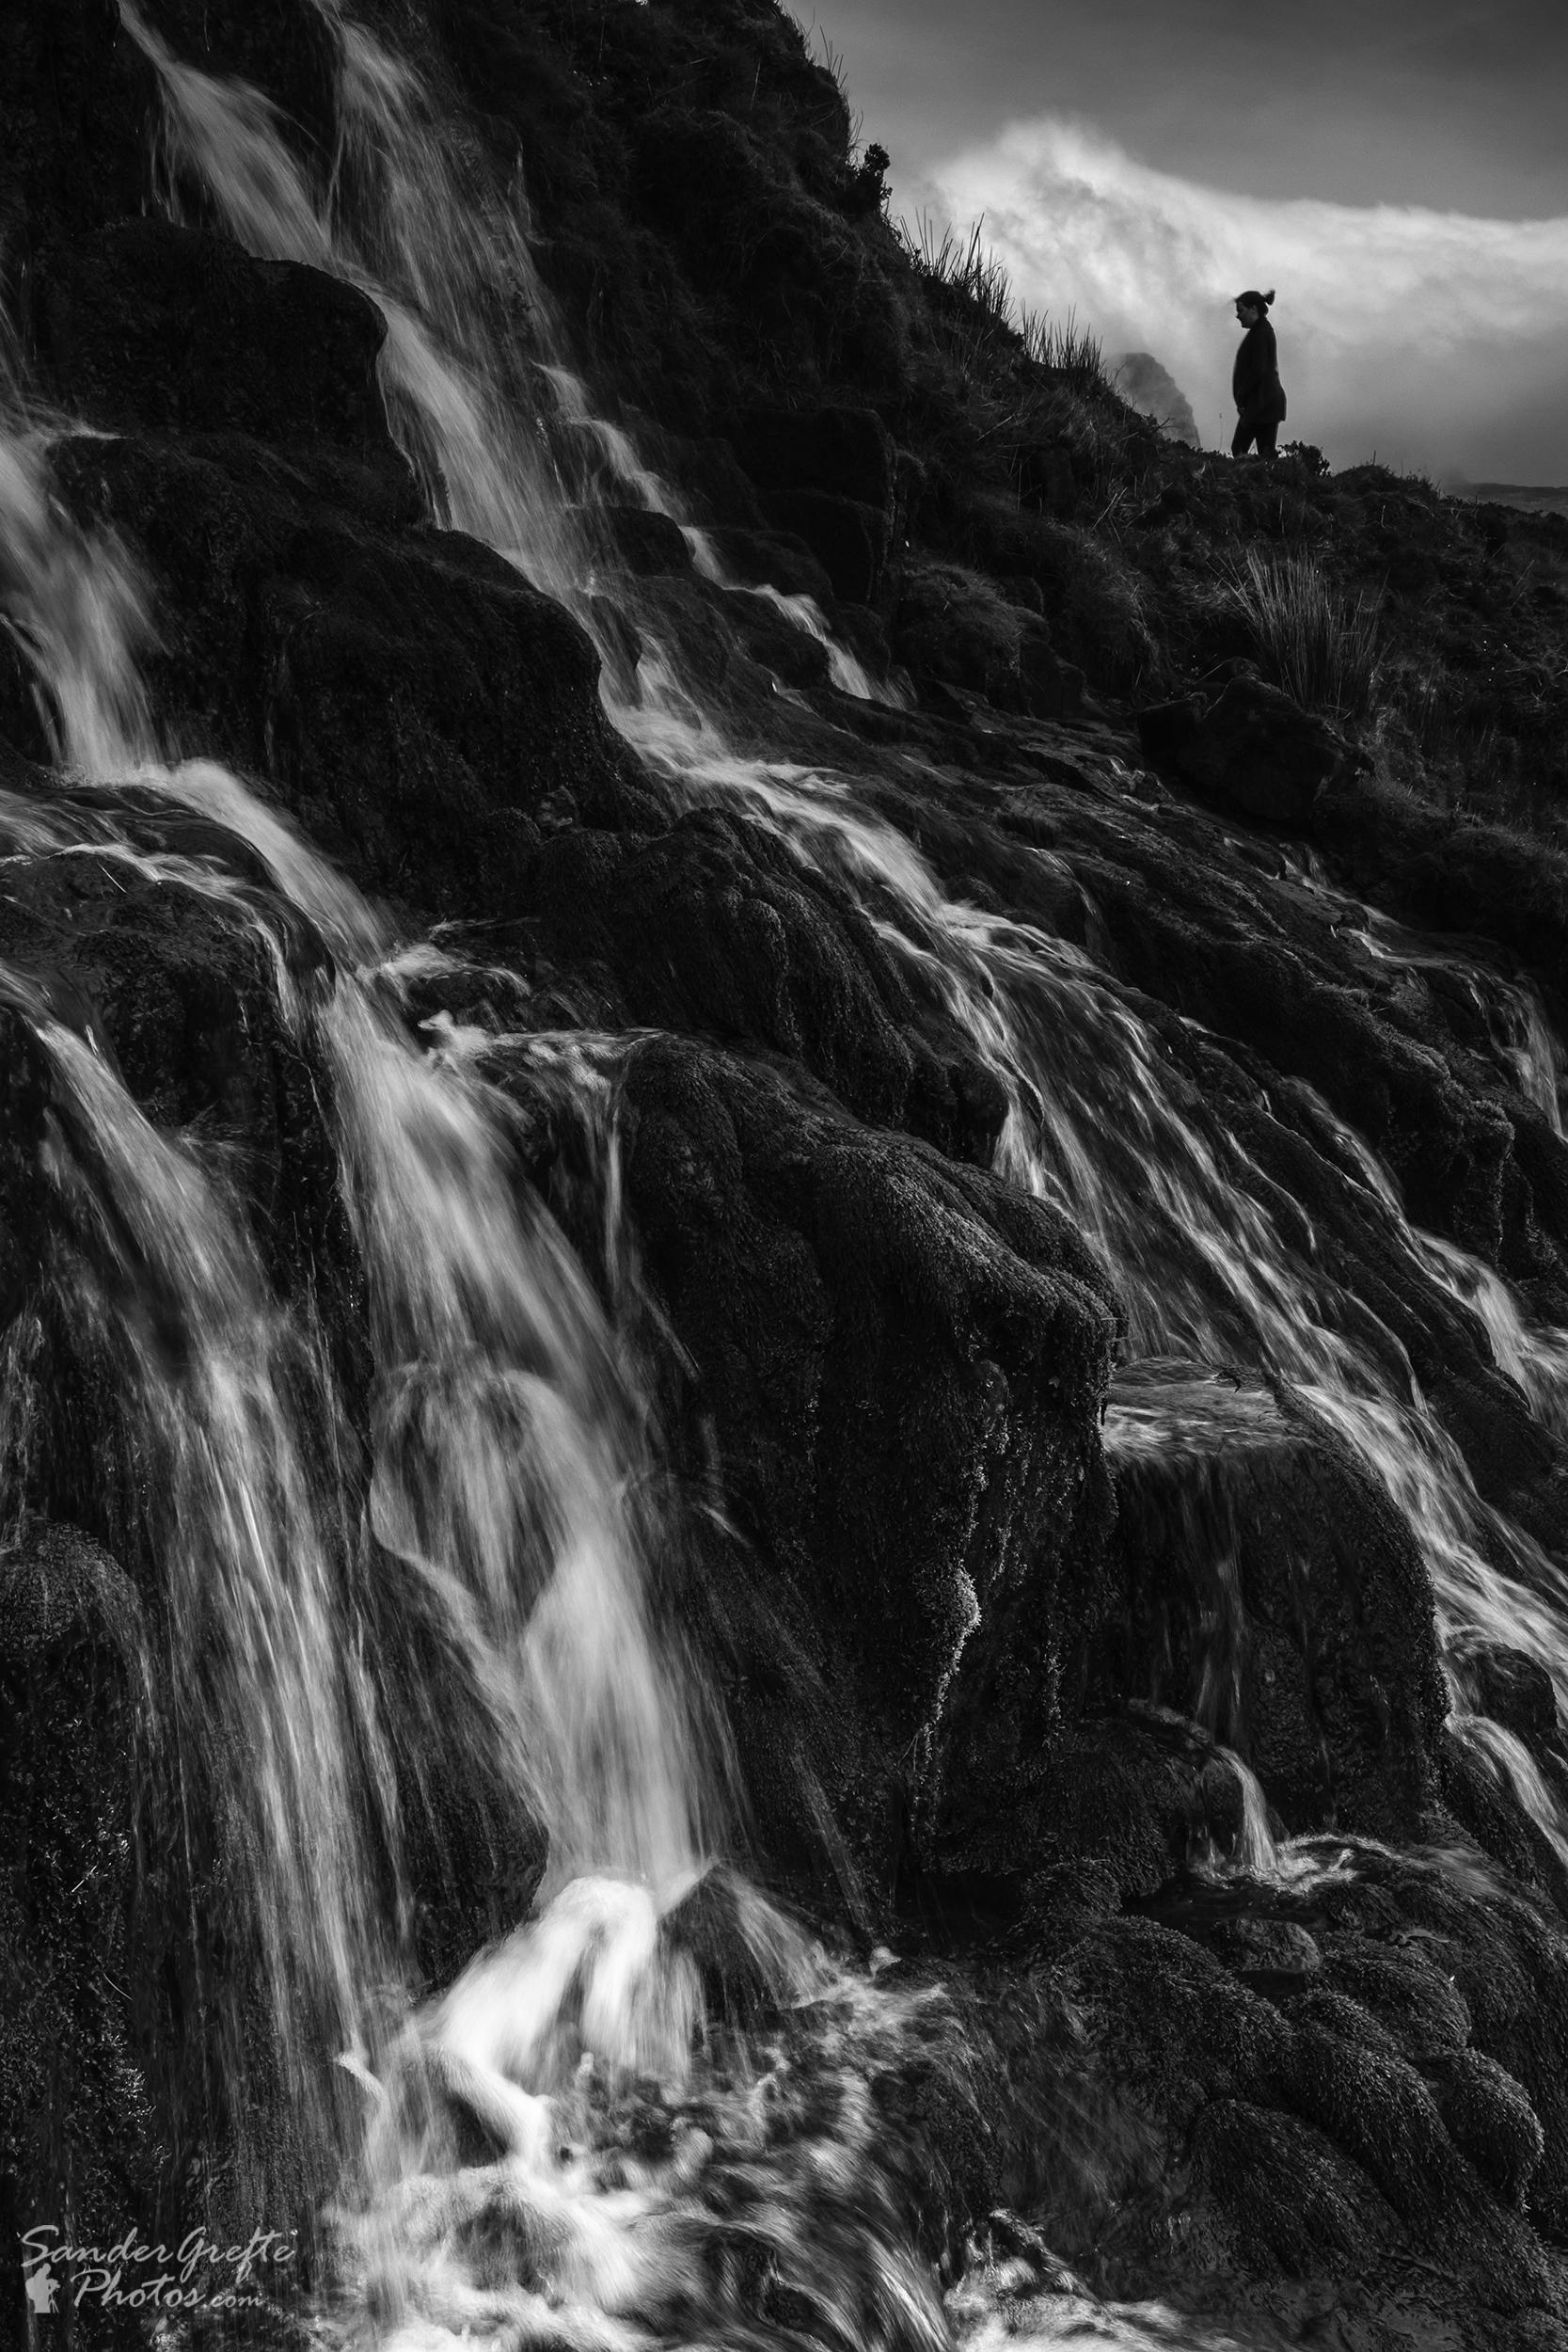 De toerist bij de Bride's Veils (Nikon D7200, 22mm, iso 100, f16, 1/20s)